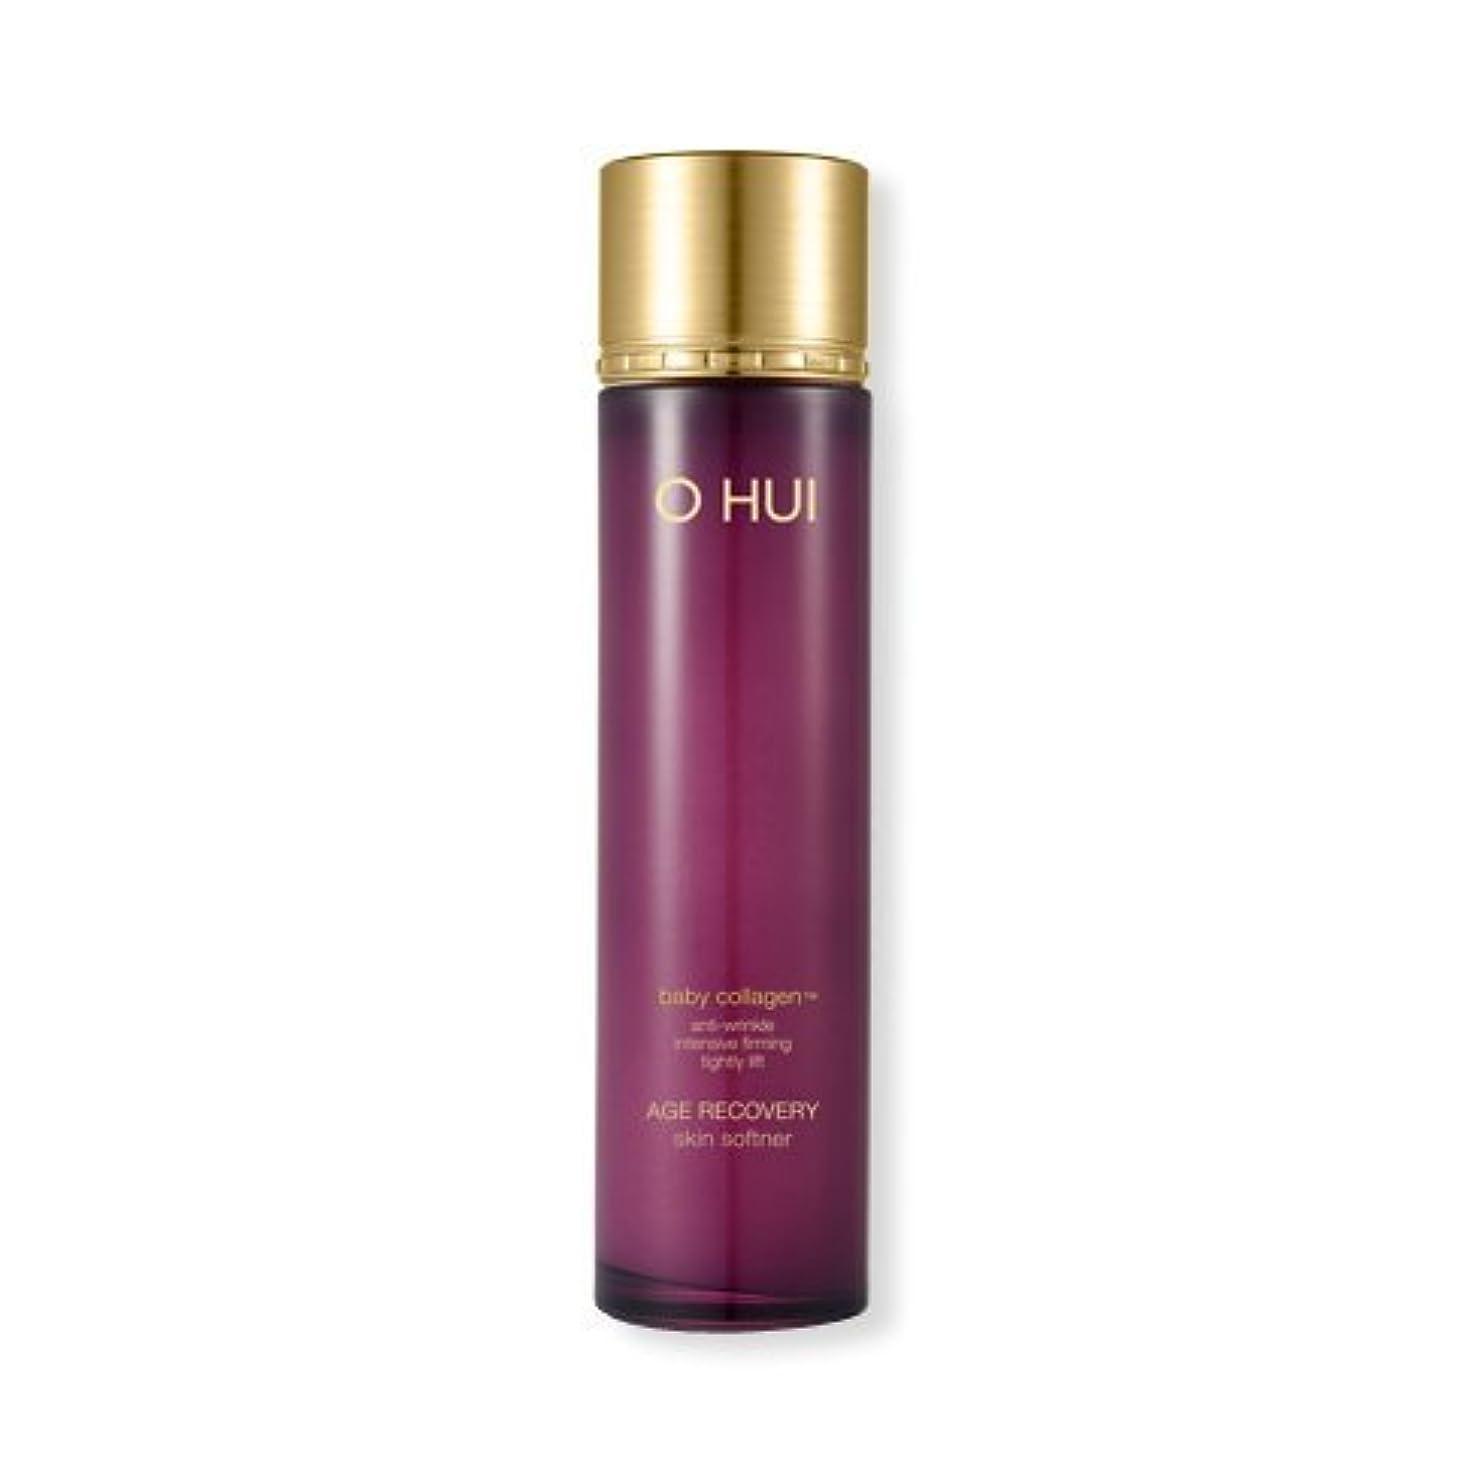 OHUI Age Recovery Skin Softener 150ml/オフィ エイジ リカバリー スキン ソフナー 150ml [並行輸入品]